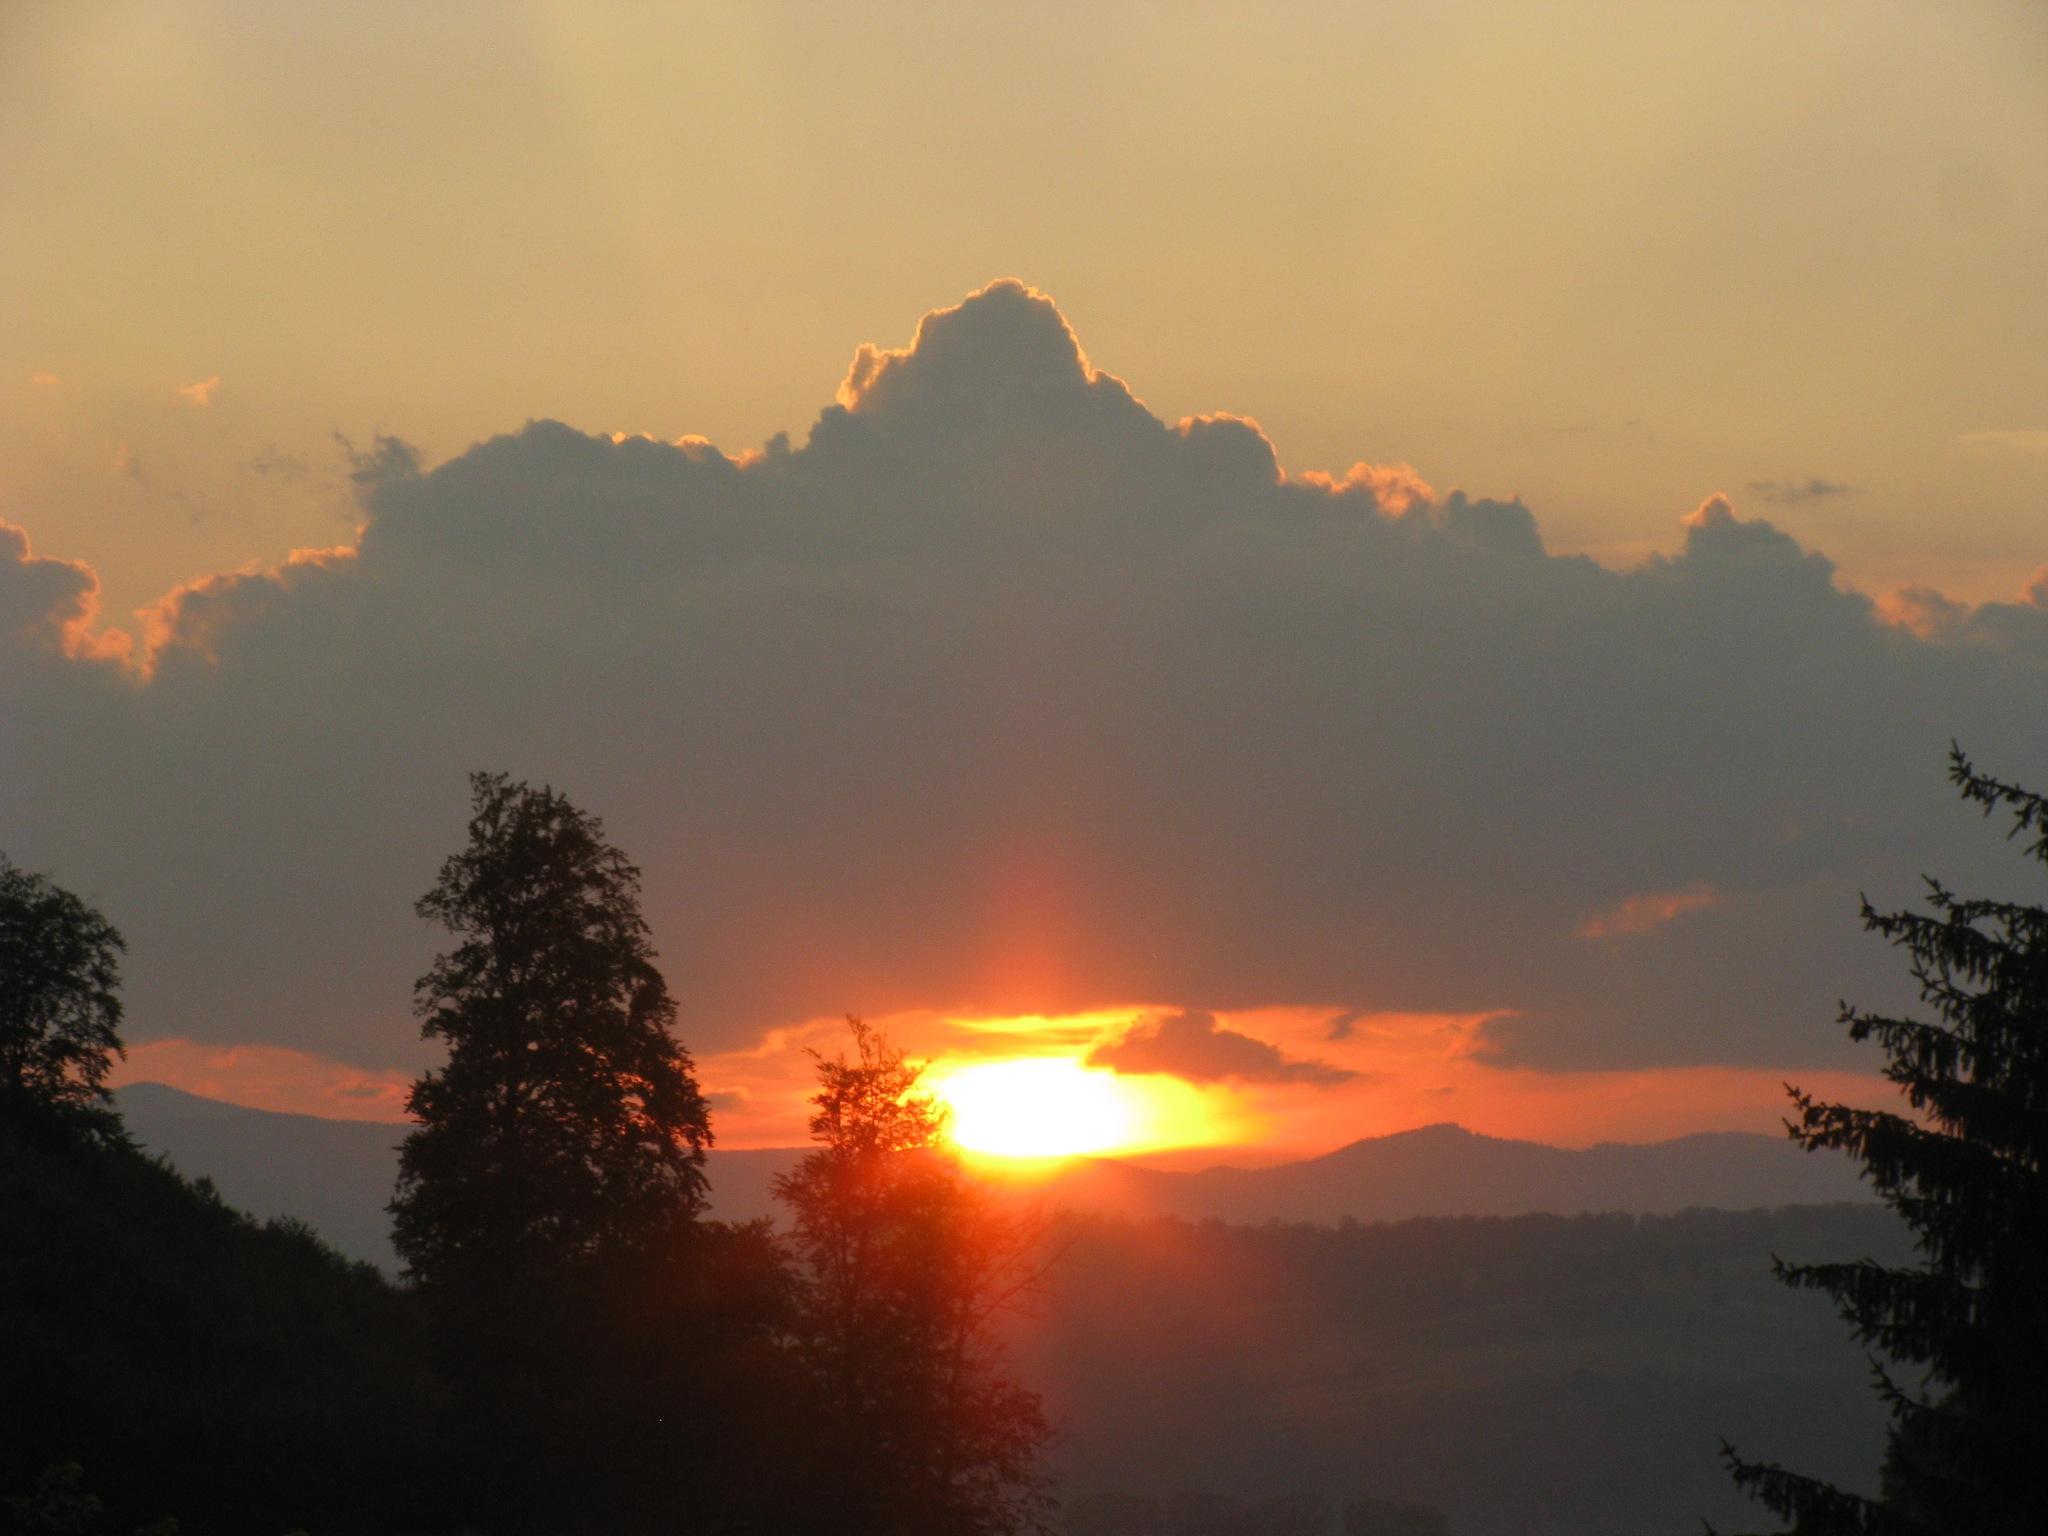 Sunset in Rasnov, Romania by Elena Maria